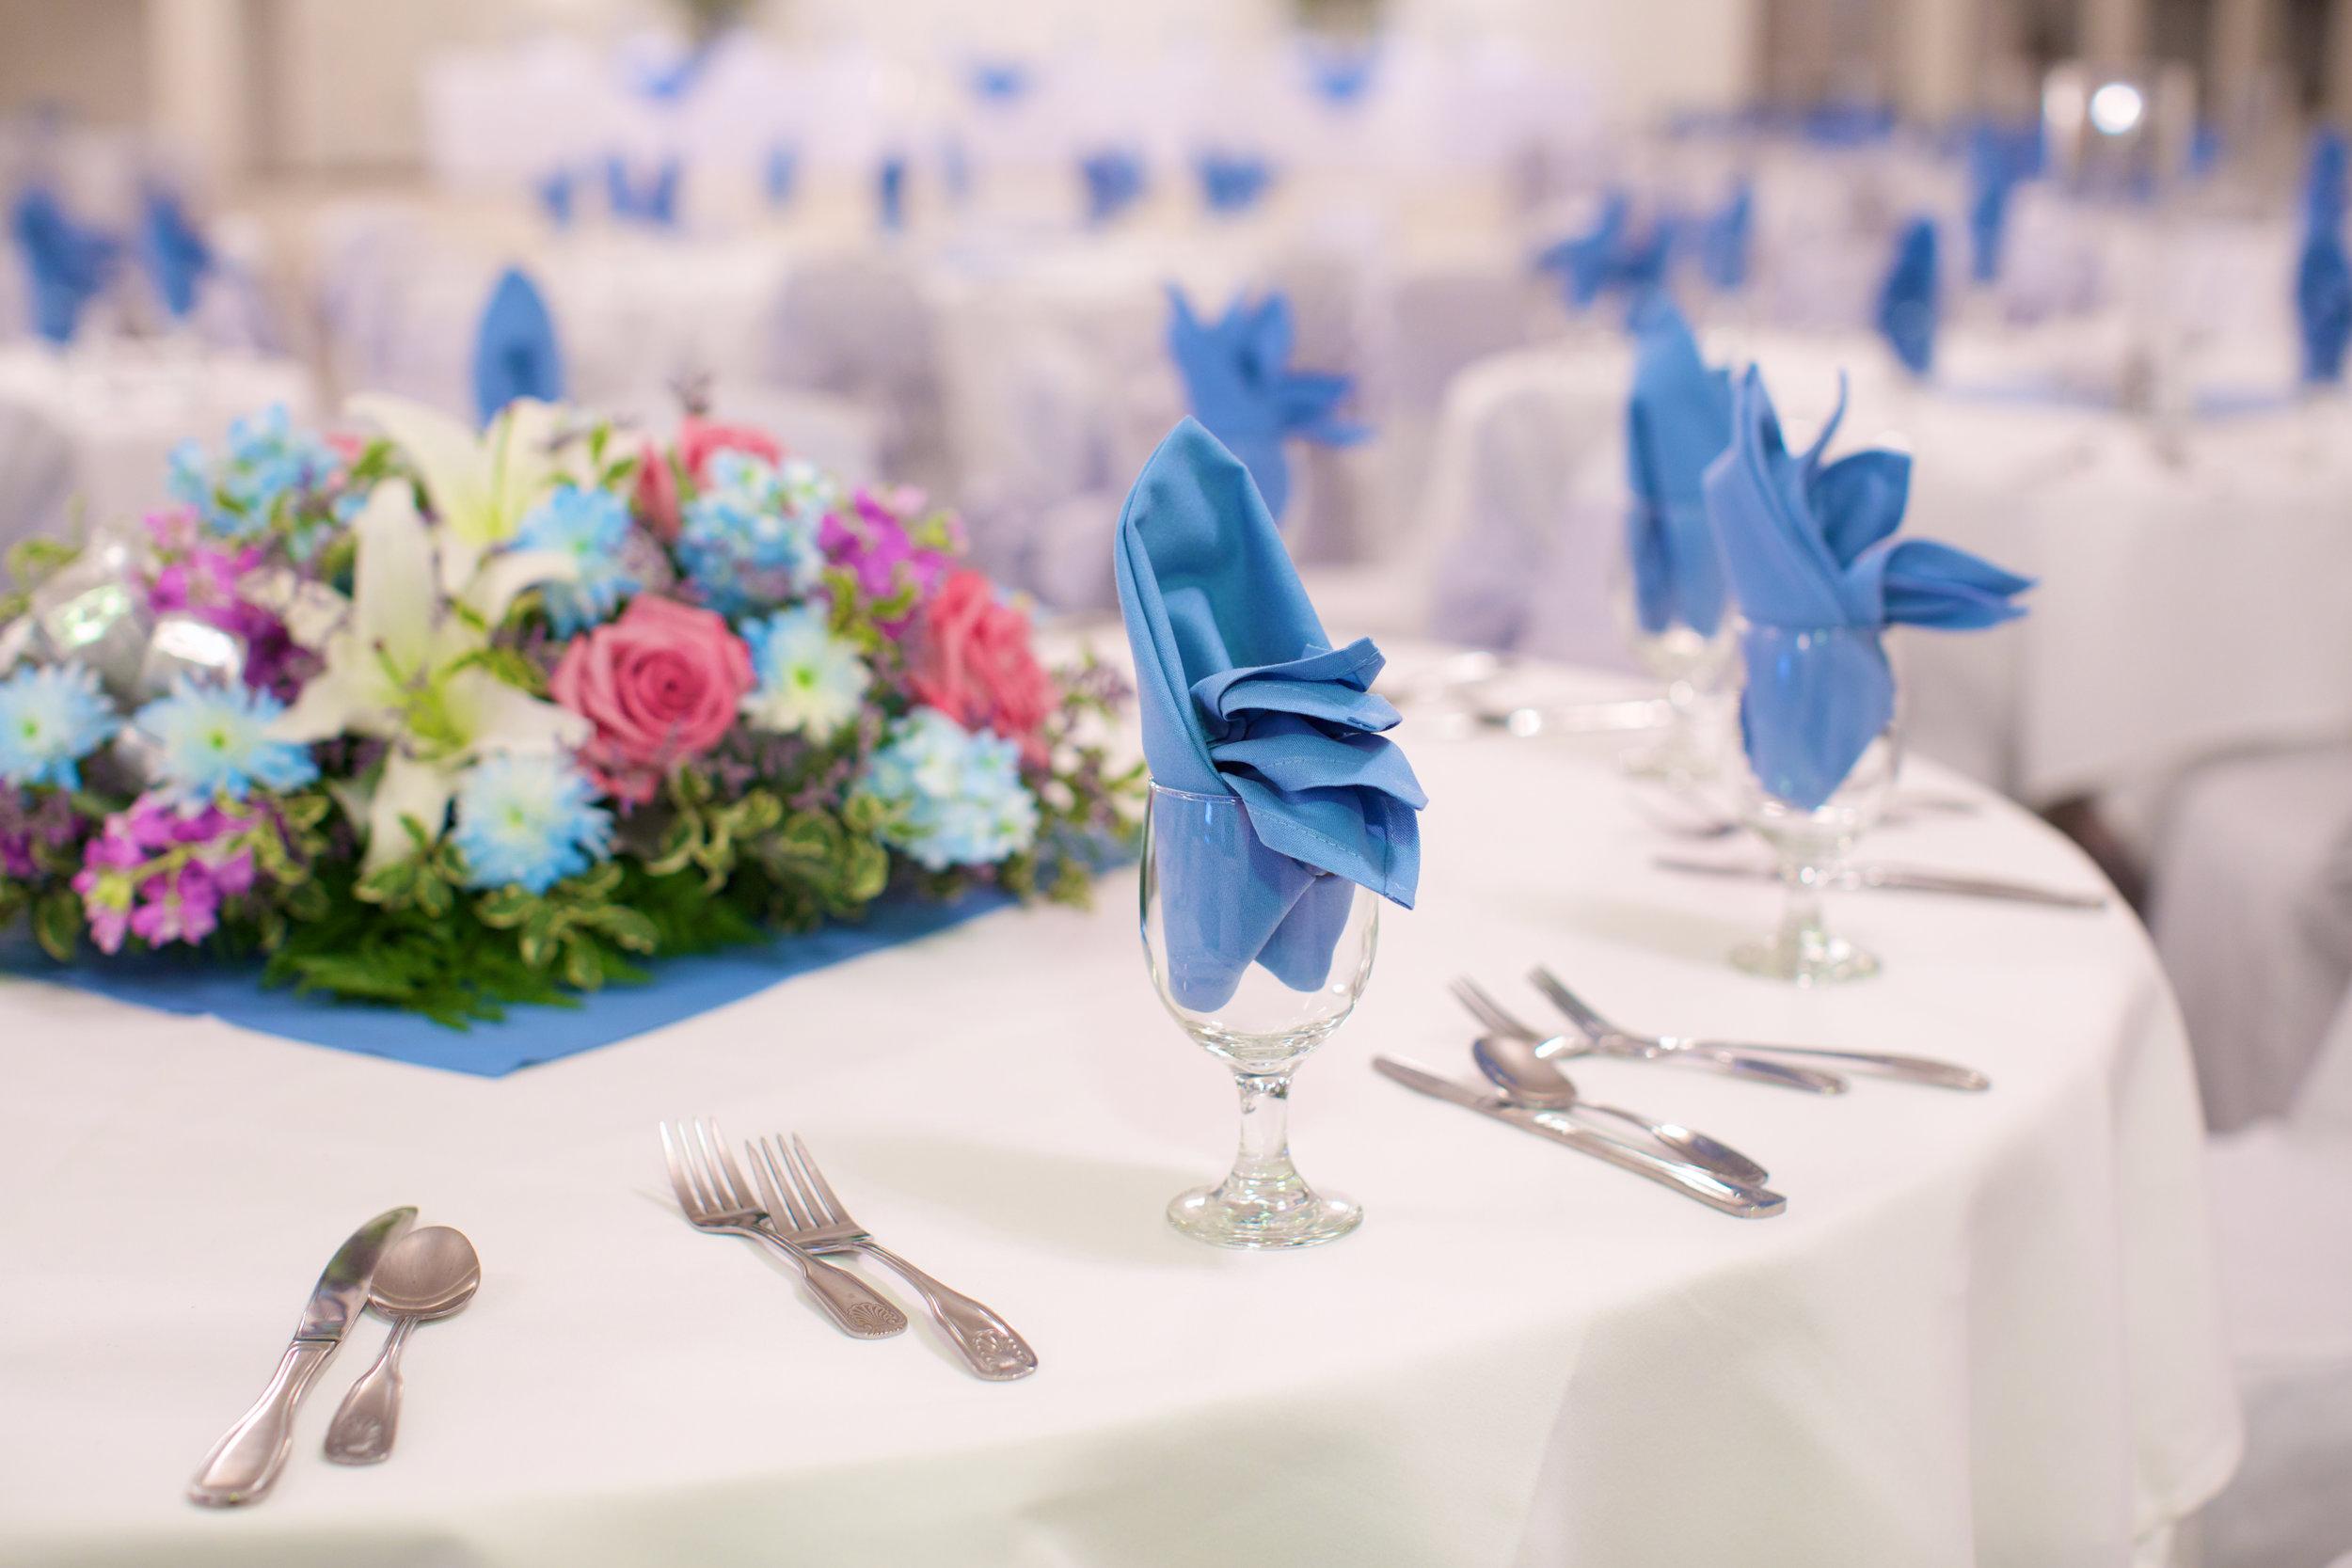 floral arrangement on dining table